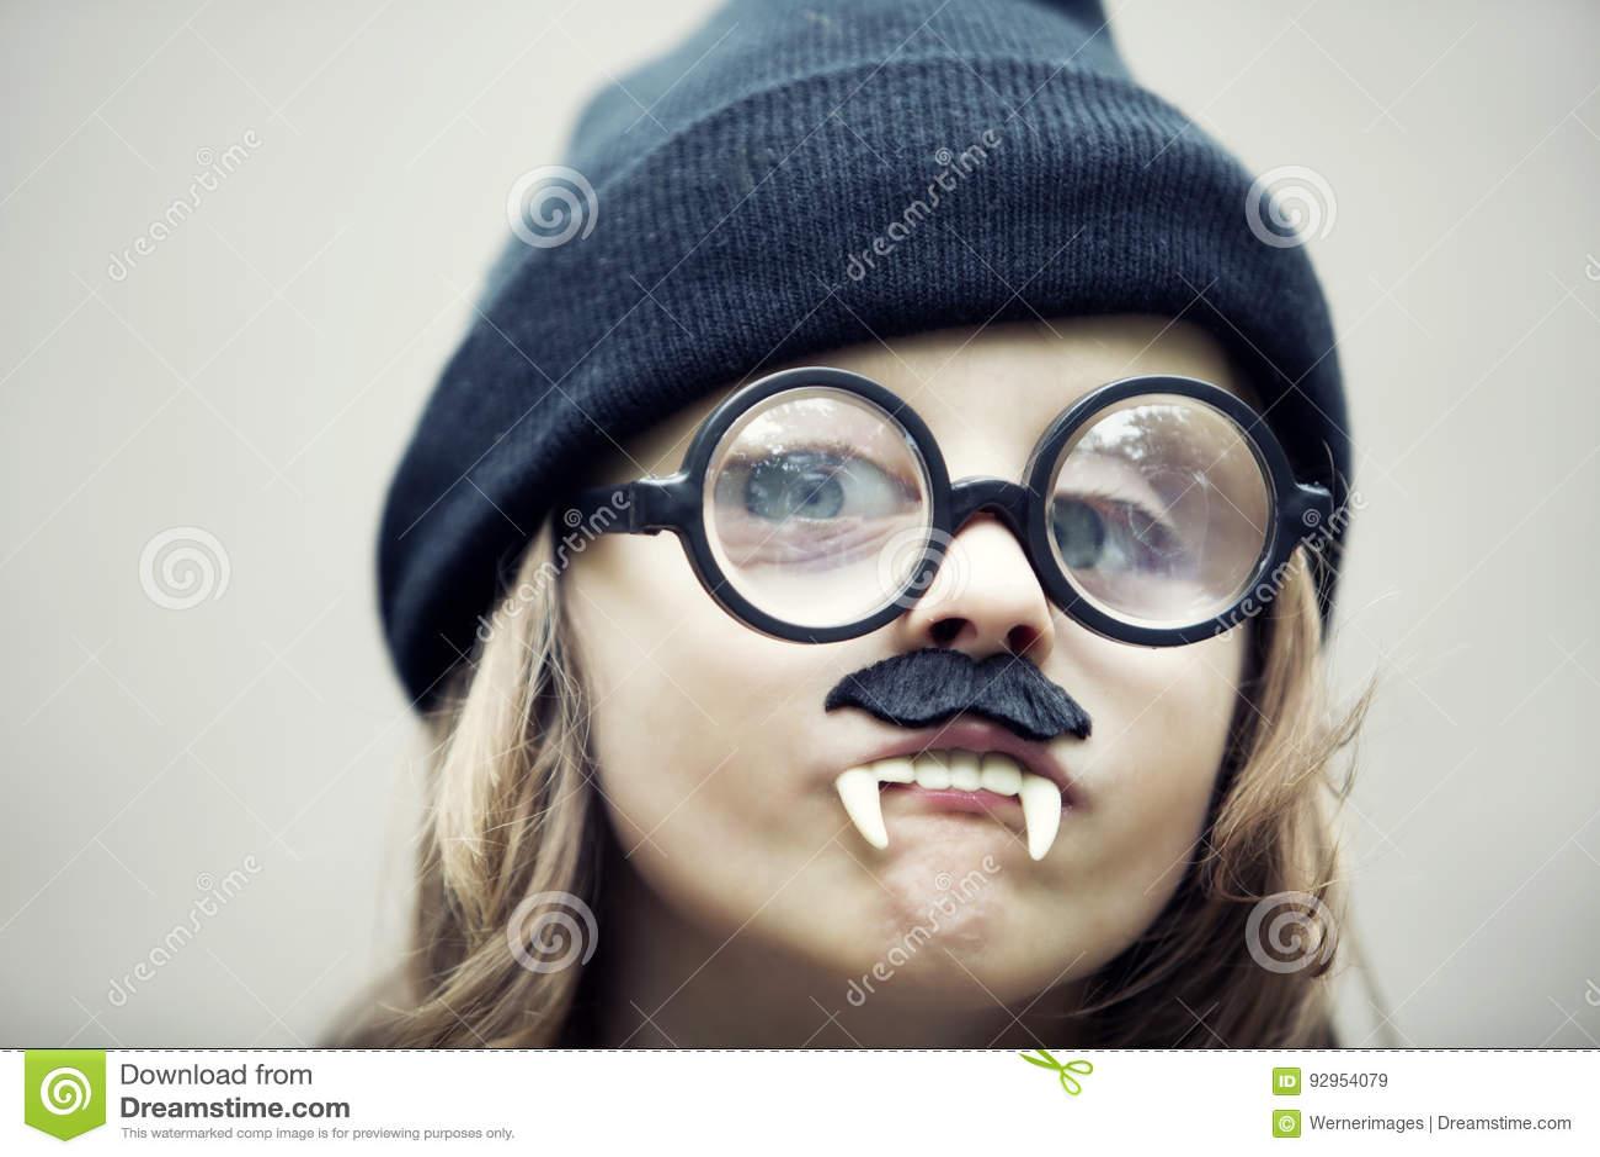 94b02585ed Αστείο πορτρέτο του νέου αγοριού με τα μεγάλα γυαλιά